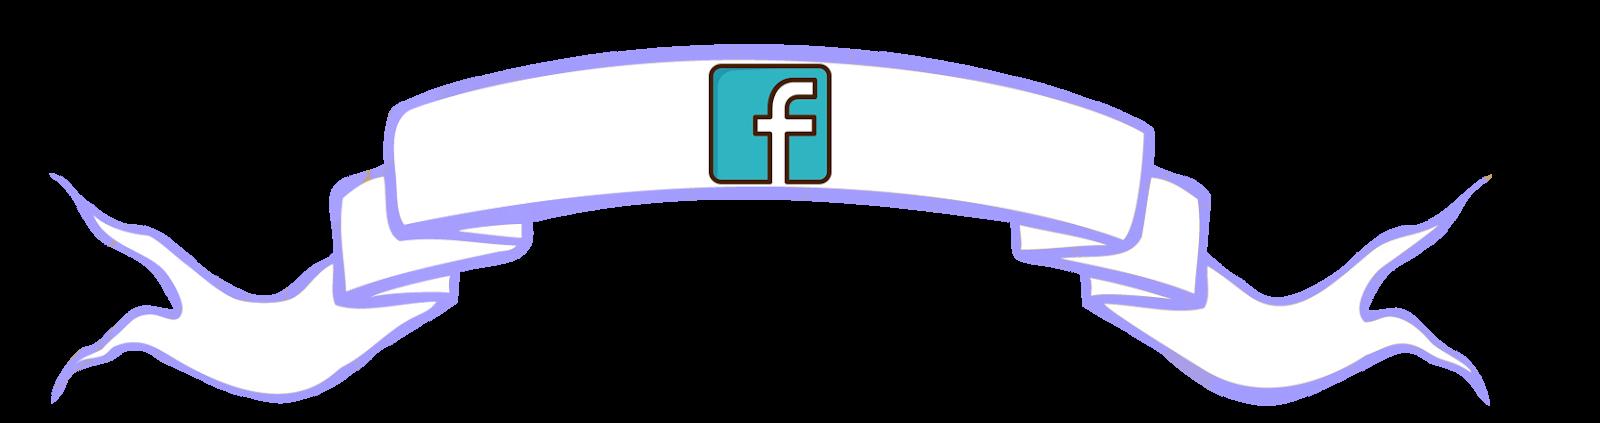 ¿Quieres unirte a mi grupo de Facebook?